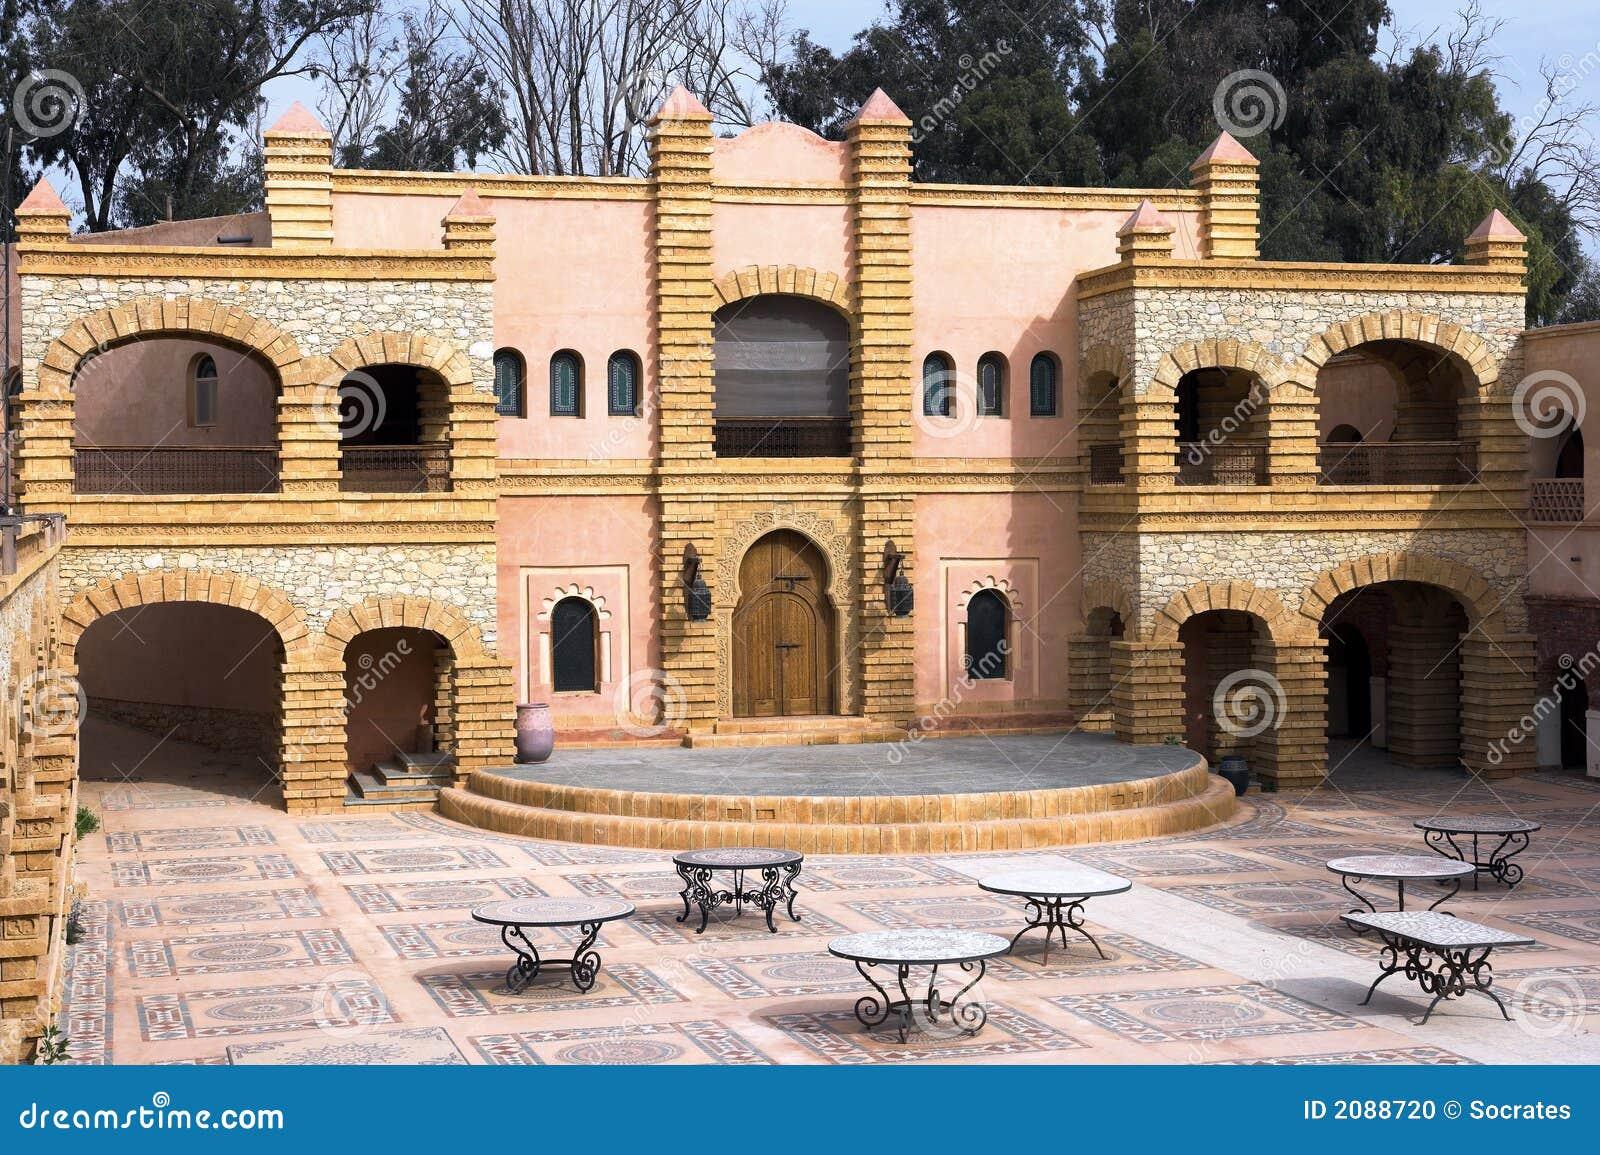 Architecture arabe maroc photo stock image du for Architecture arabe